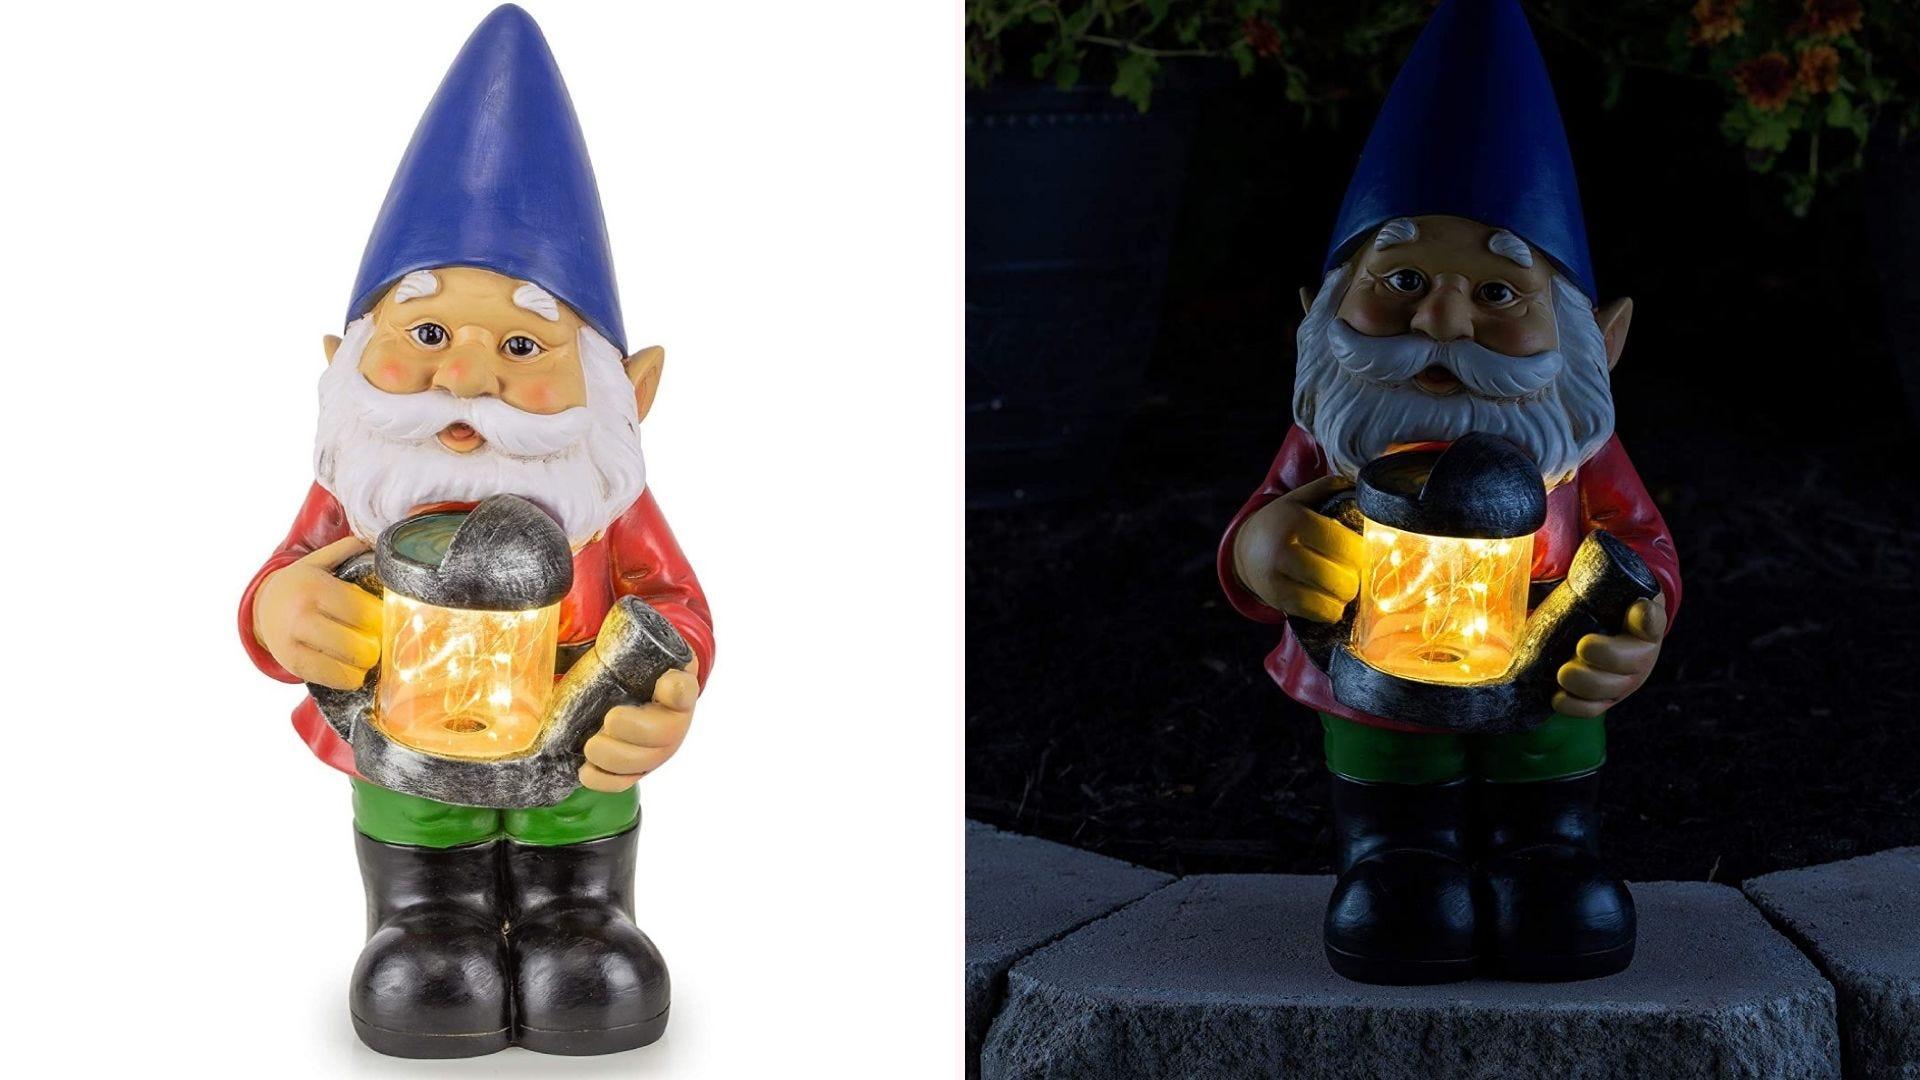 Night setting, LED lit gnome holding water sprinkler